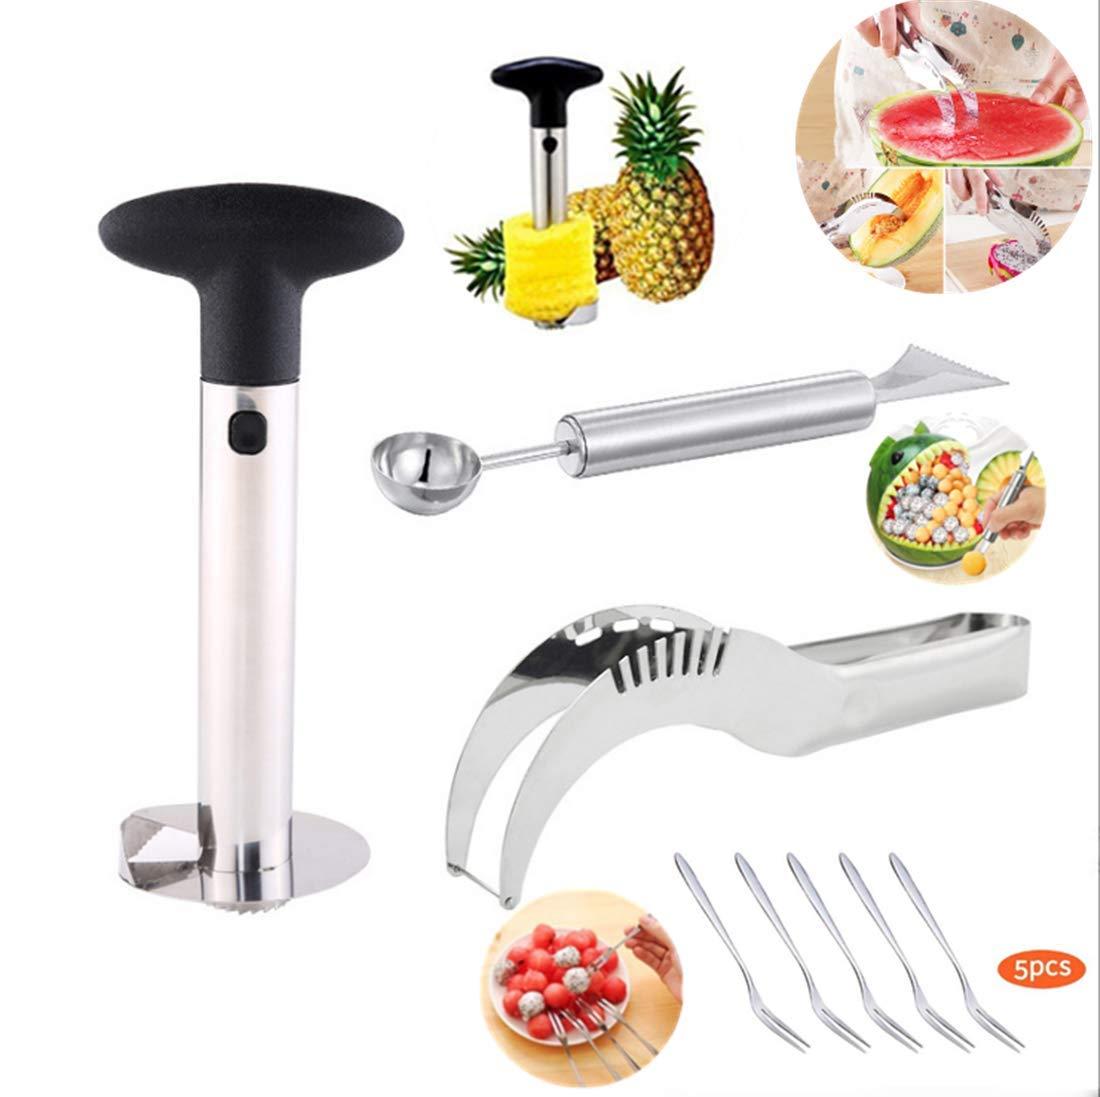 Pineapple corer,watermelon slicer, carving knife stainless steel fruit tool kitchen gadget 5 pack fruit fork (1) by JOY LI